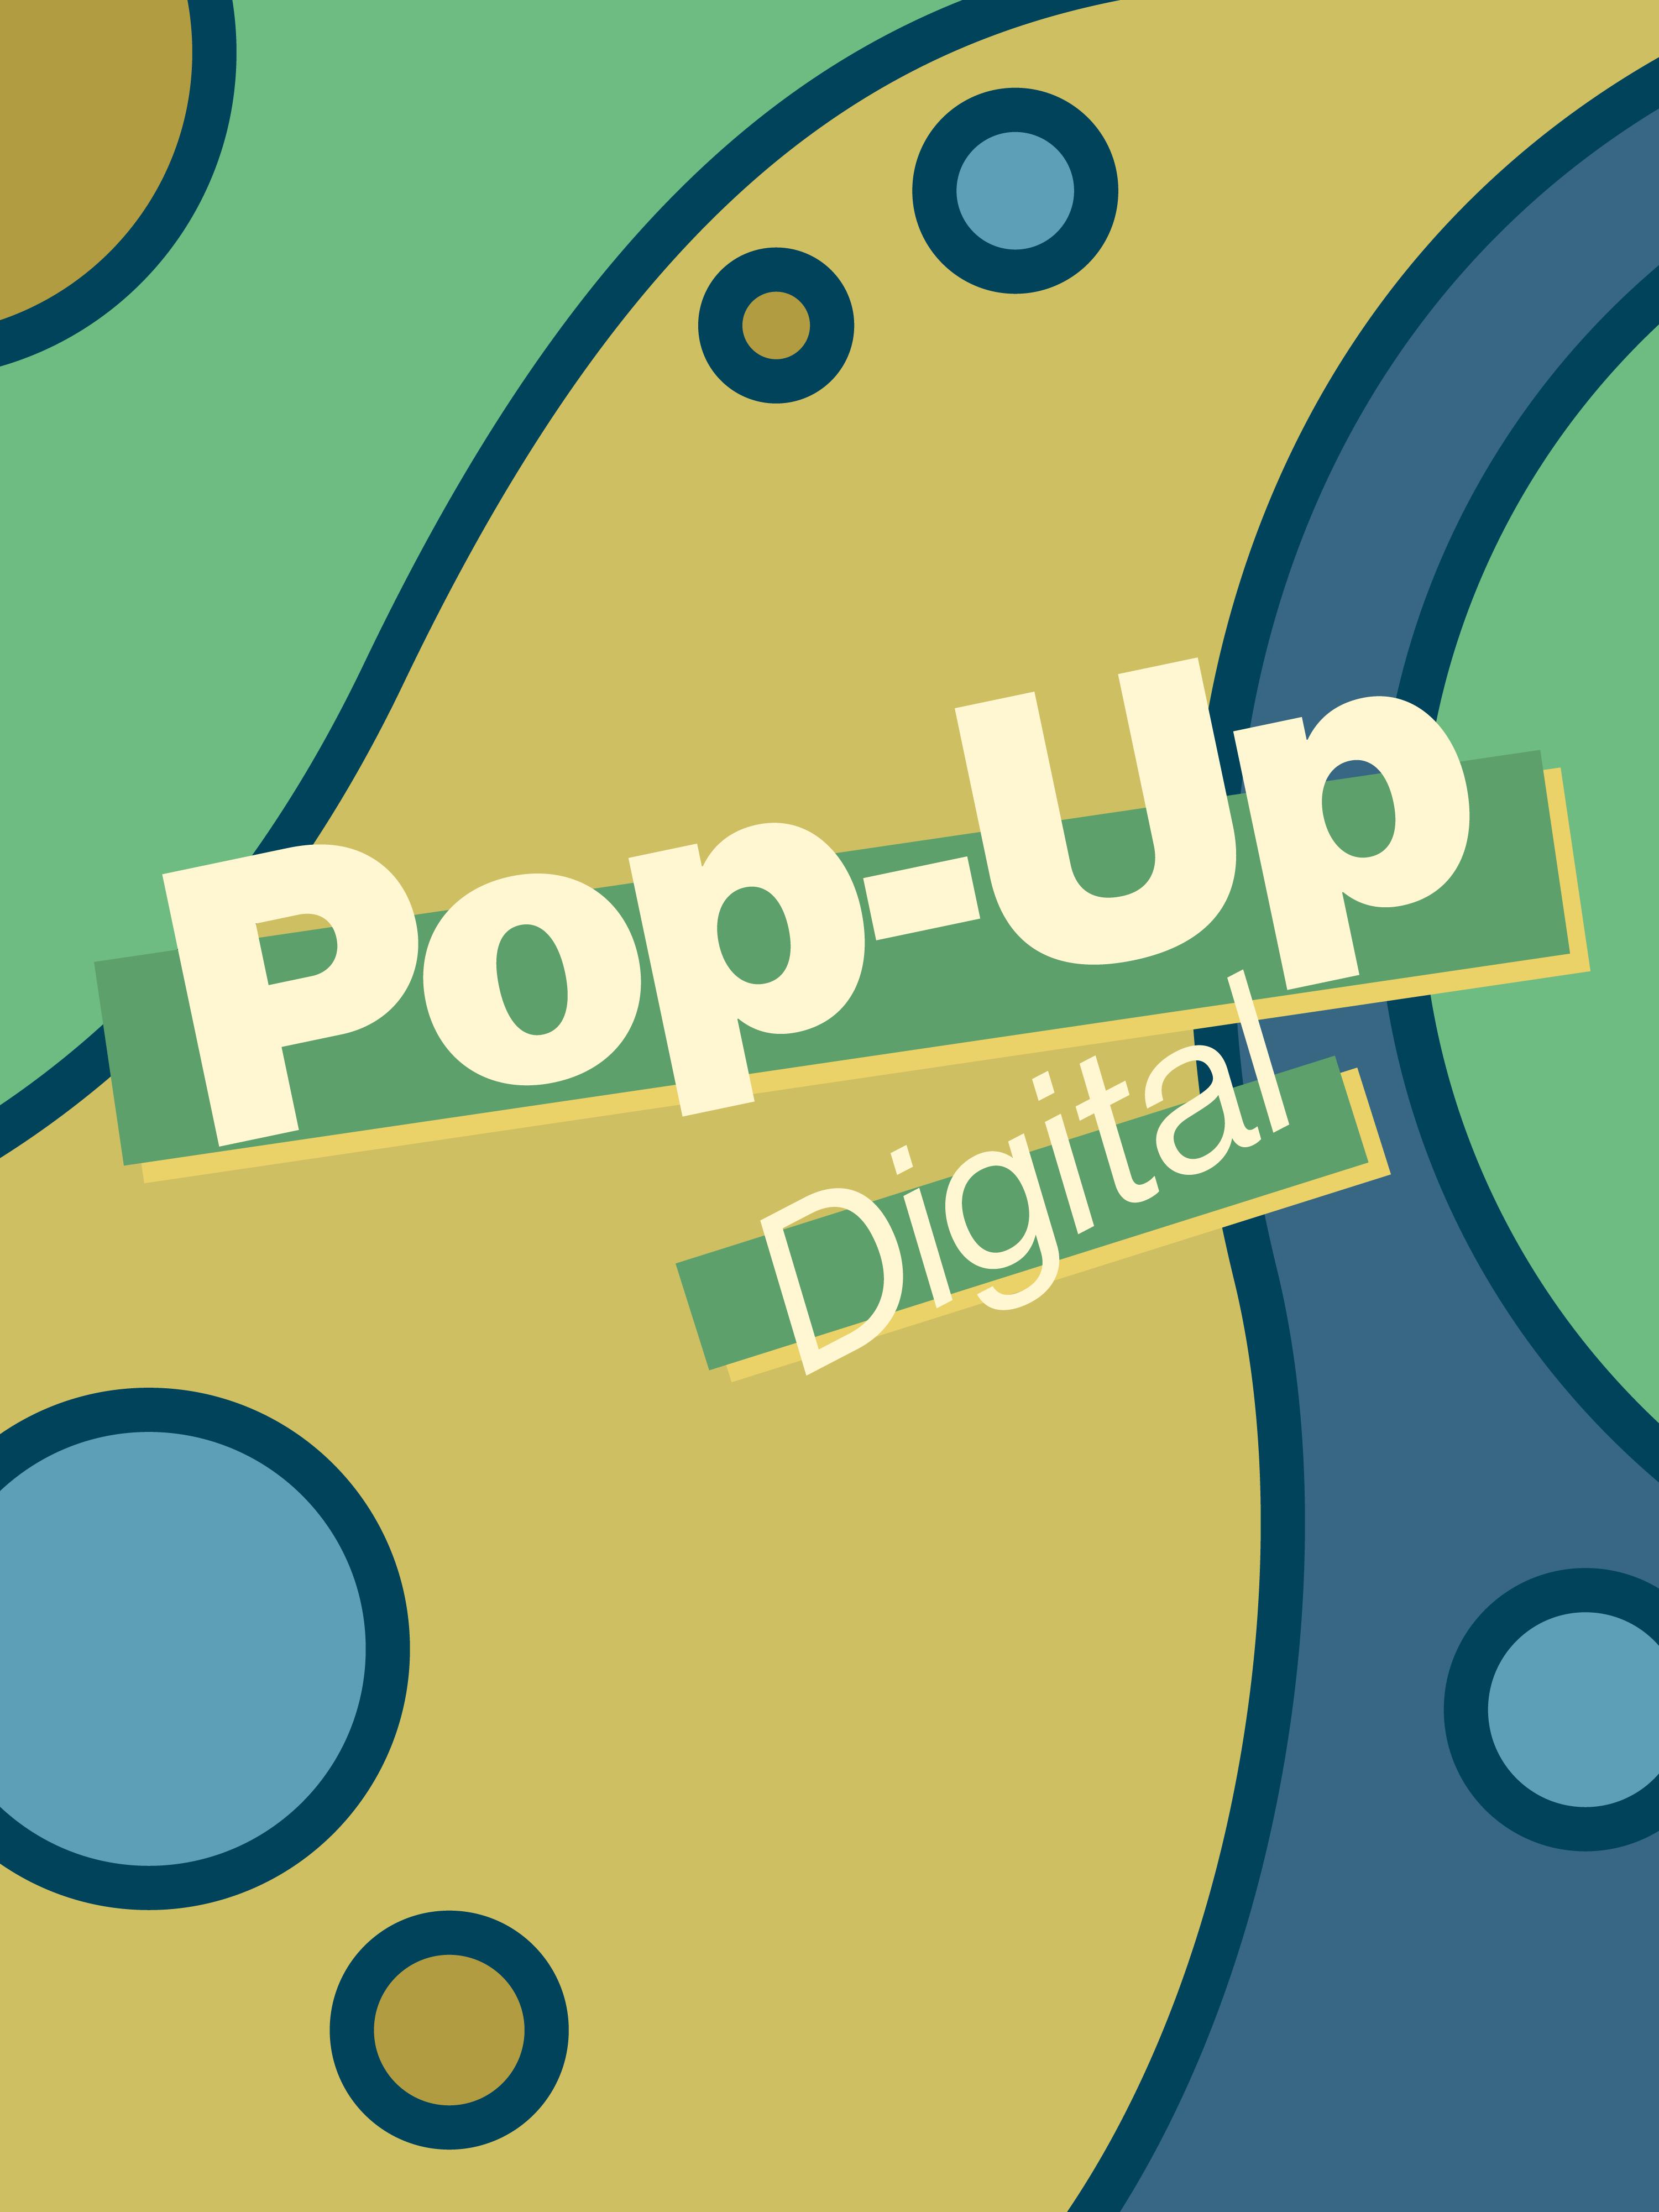 Pop-Up Digital exhibition poster